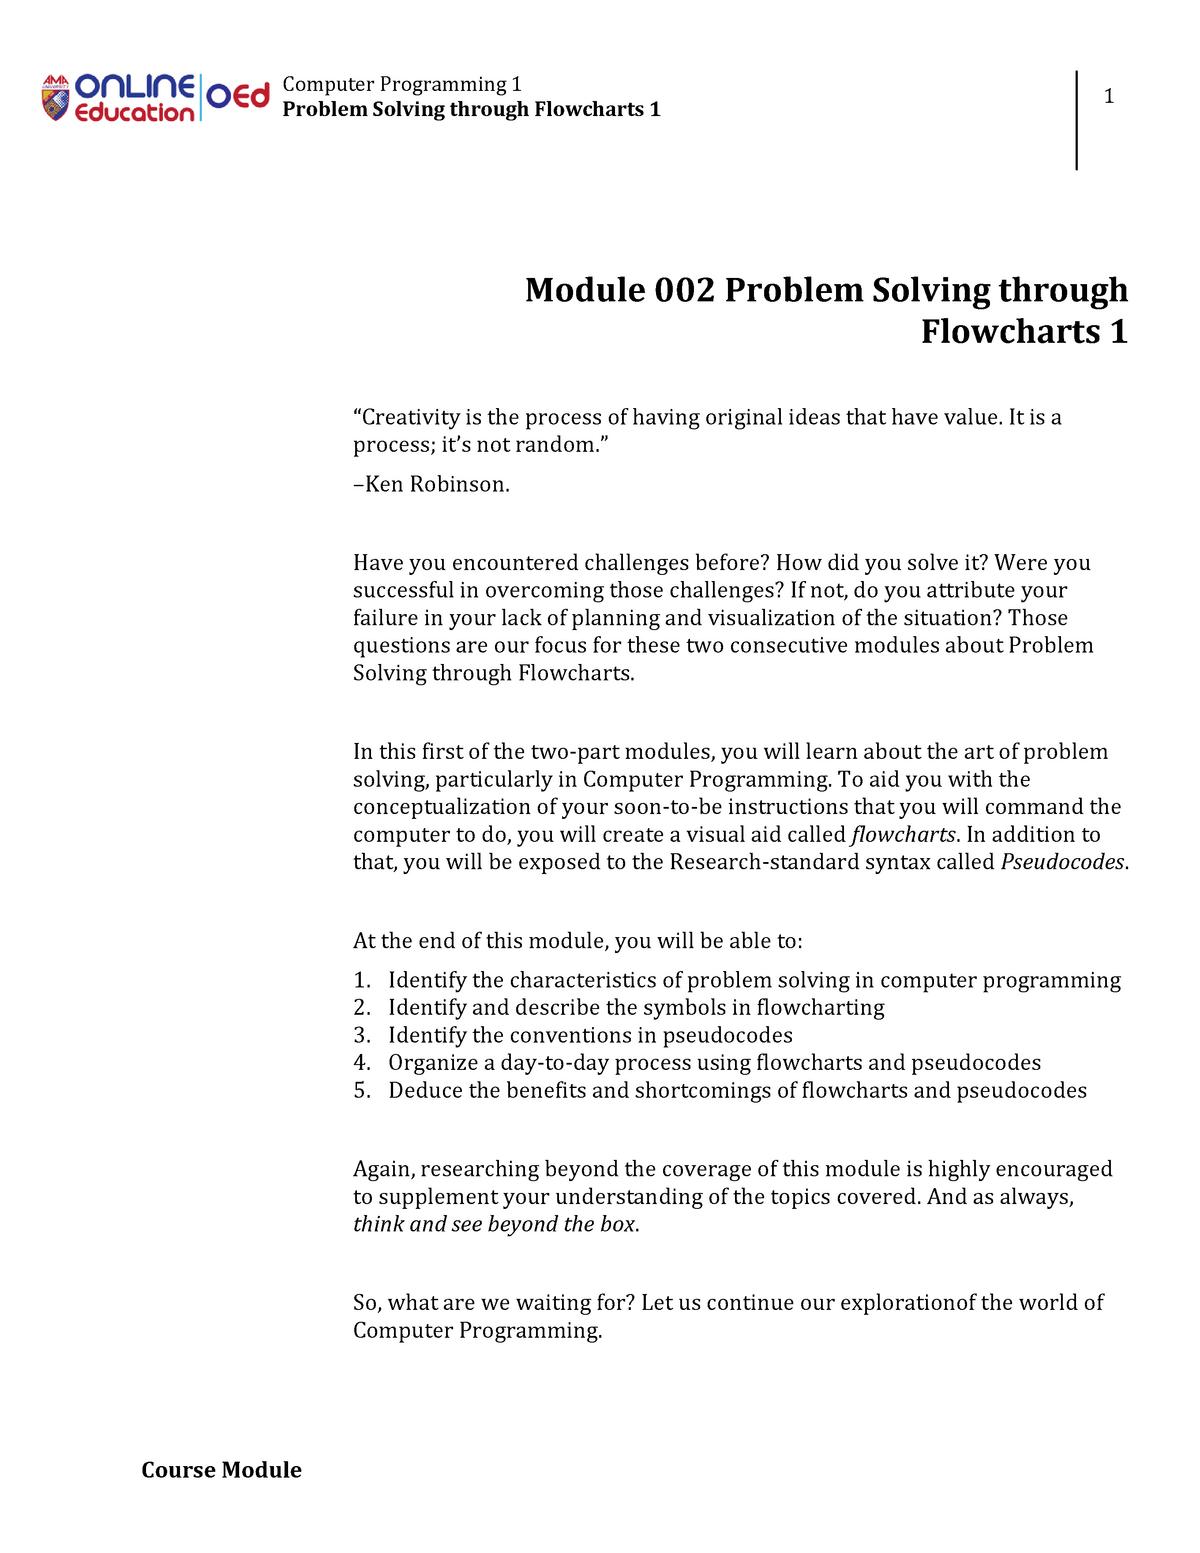 Week002-Module Problem Solving Through Flowcharts - Bachelor of